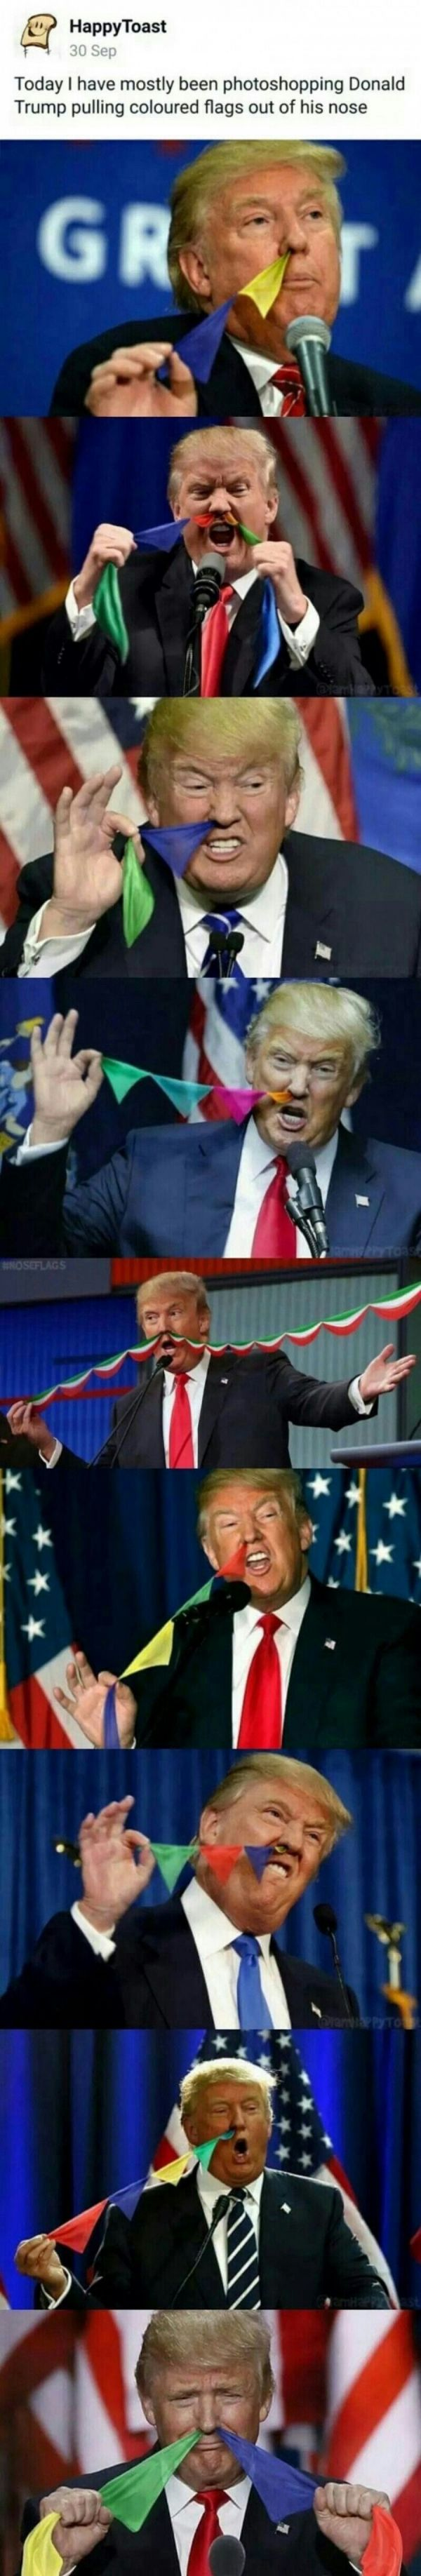 photoshop Trumpa